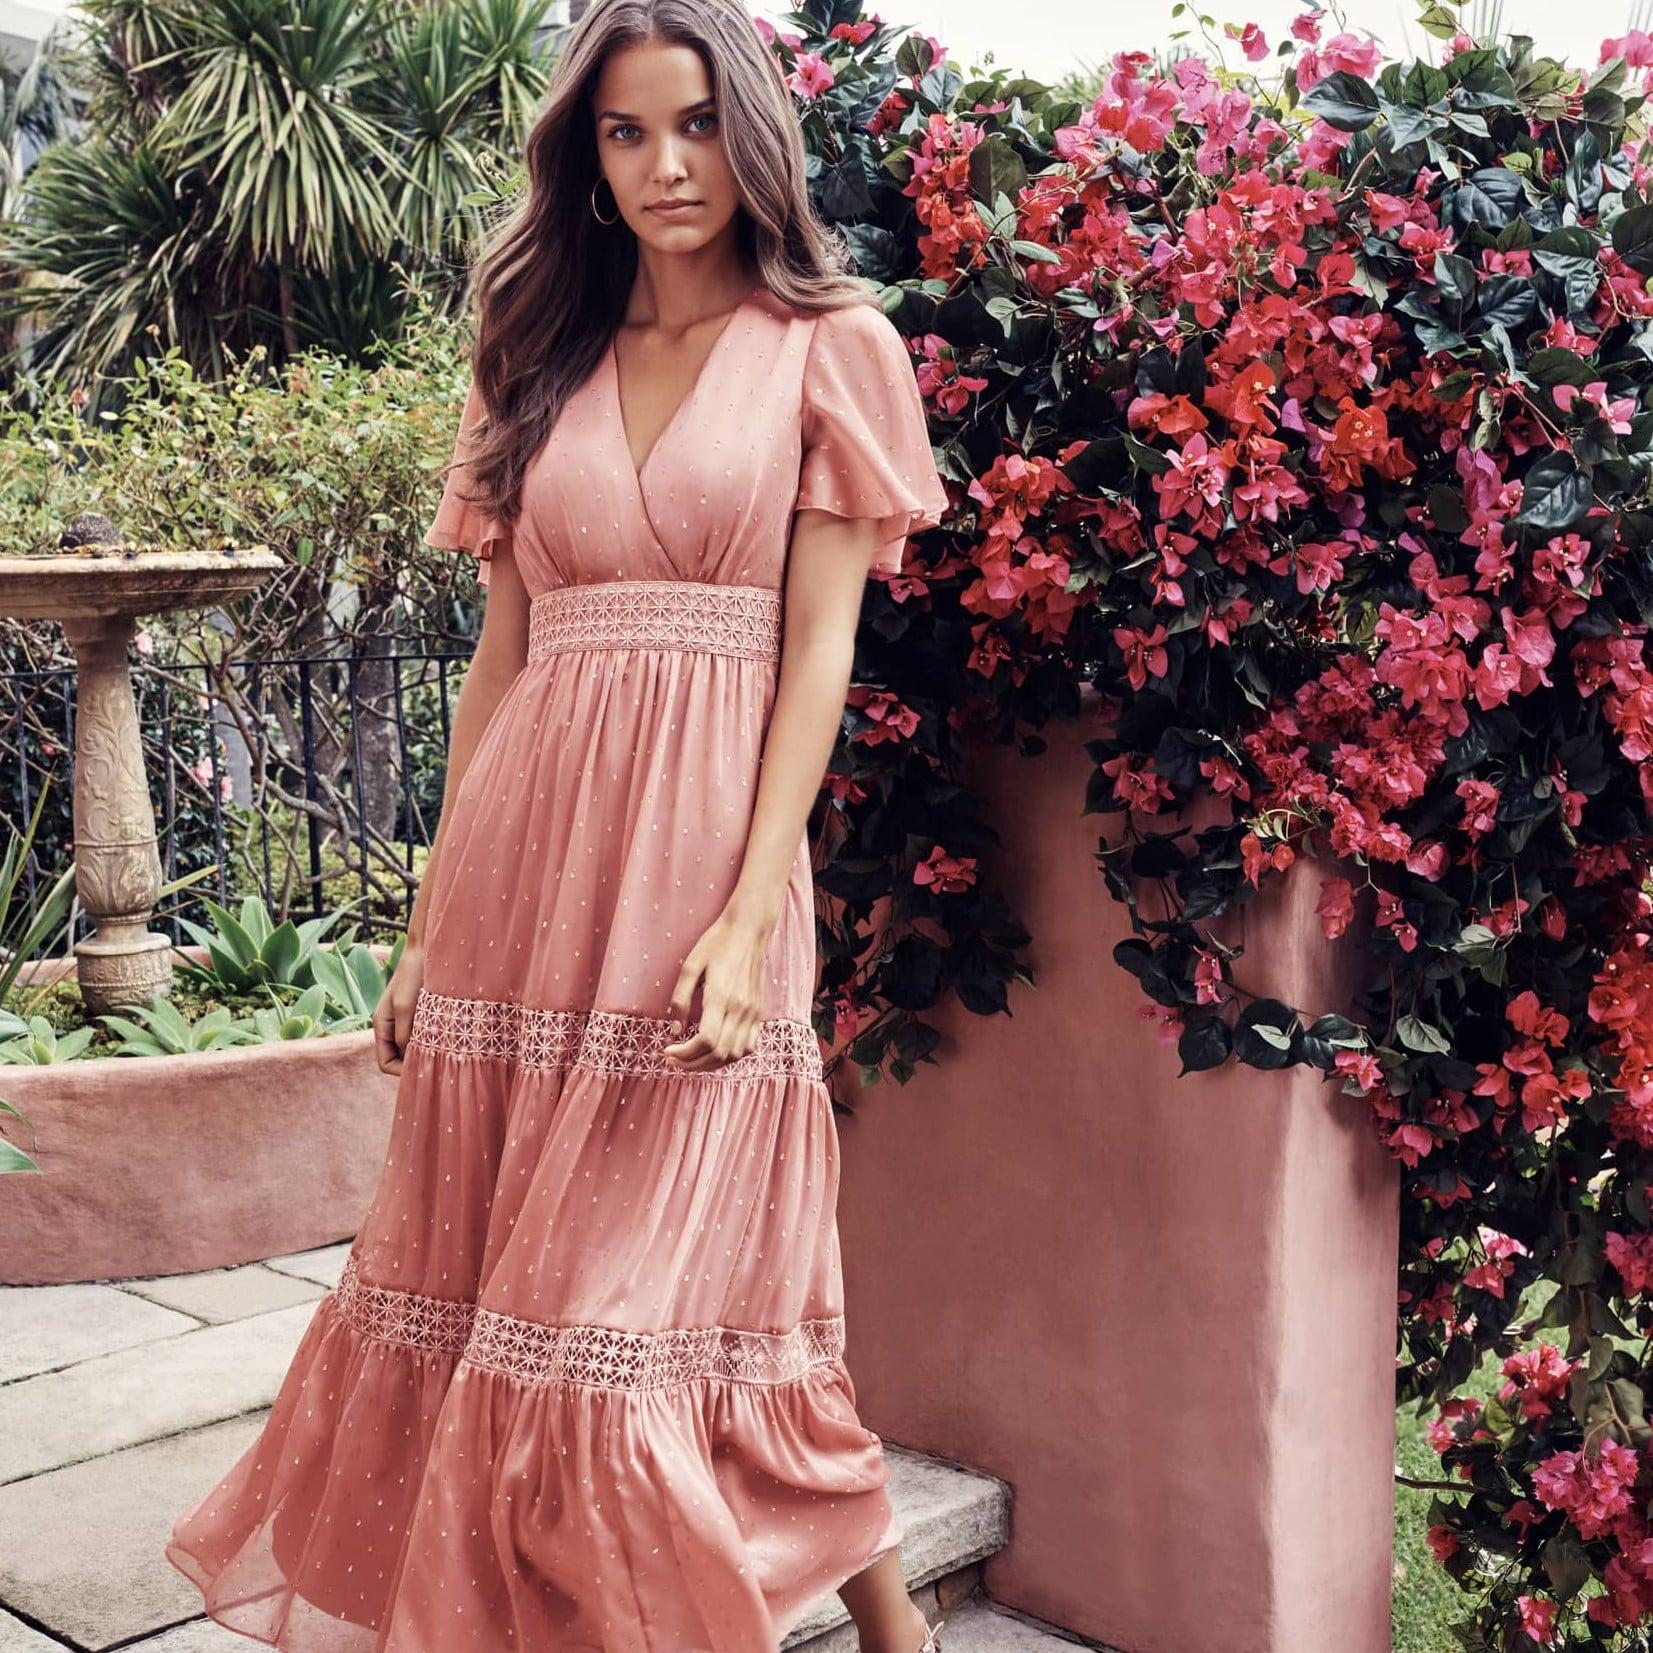 500f3495 Bardot Gemma Halter Lace Sheath Dress | Summer Dresses on Sale at Nordstrom  2019 | POPSUGAR Fashion Photo 13